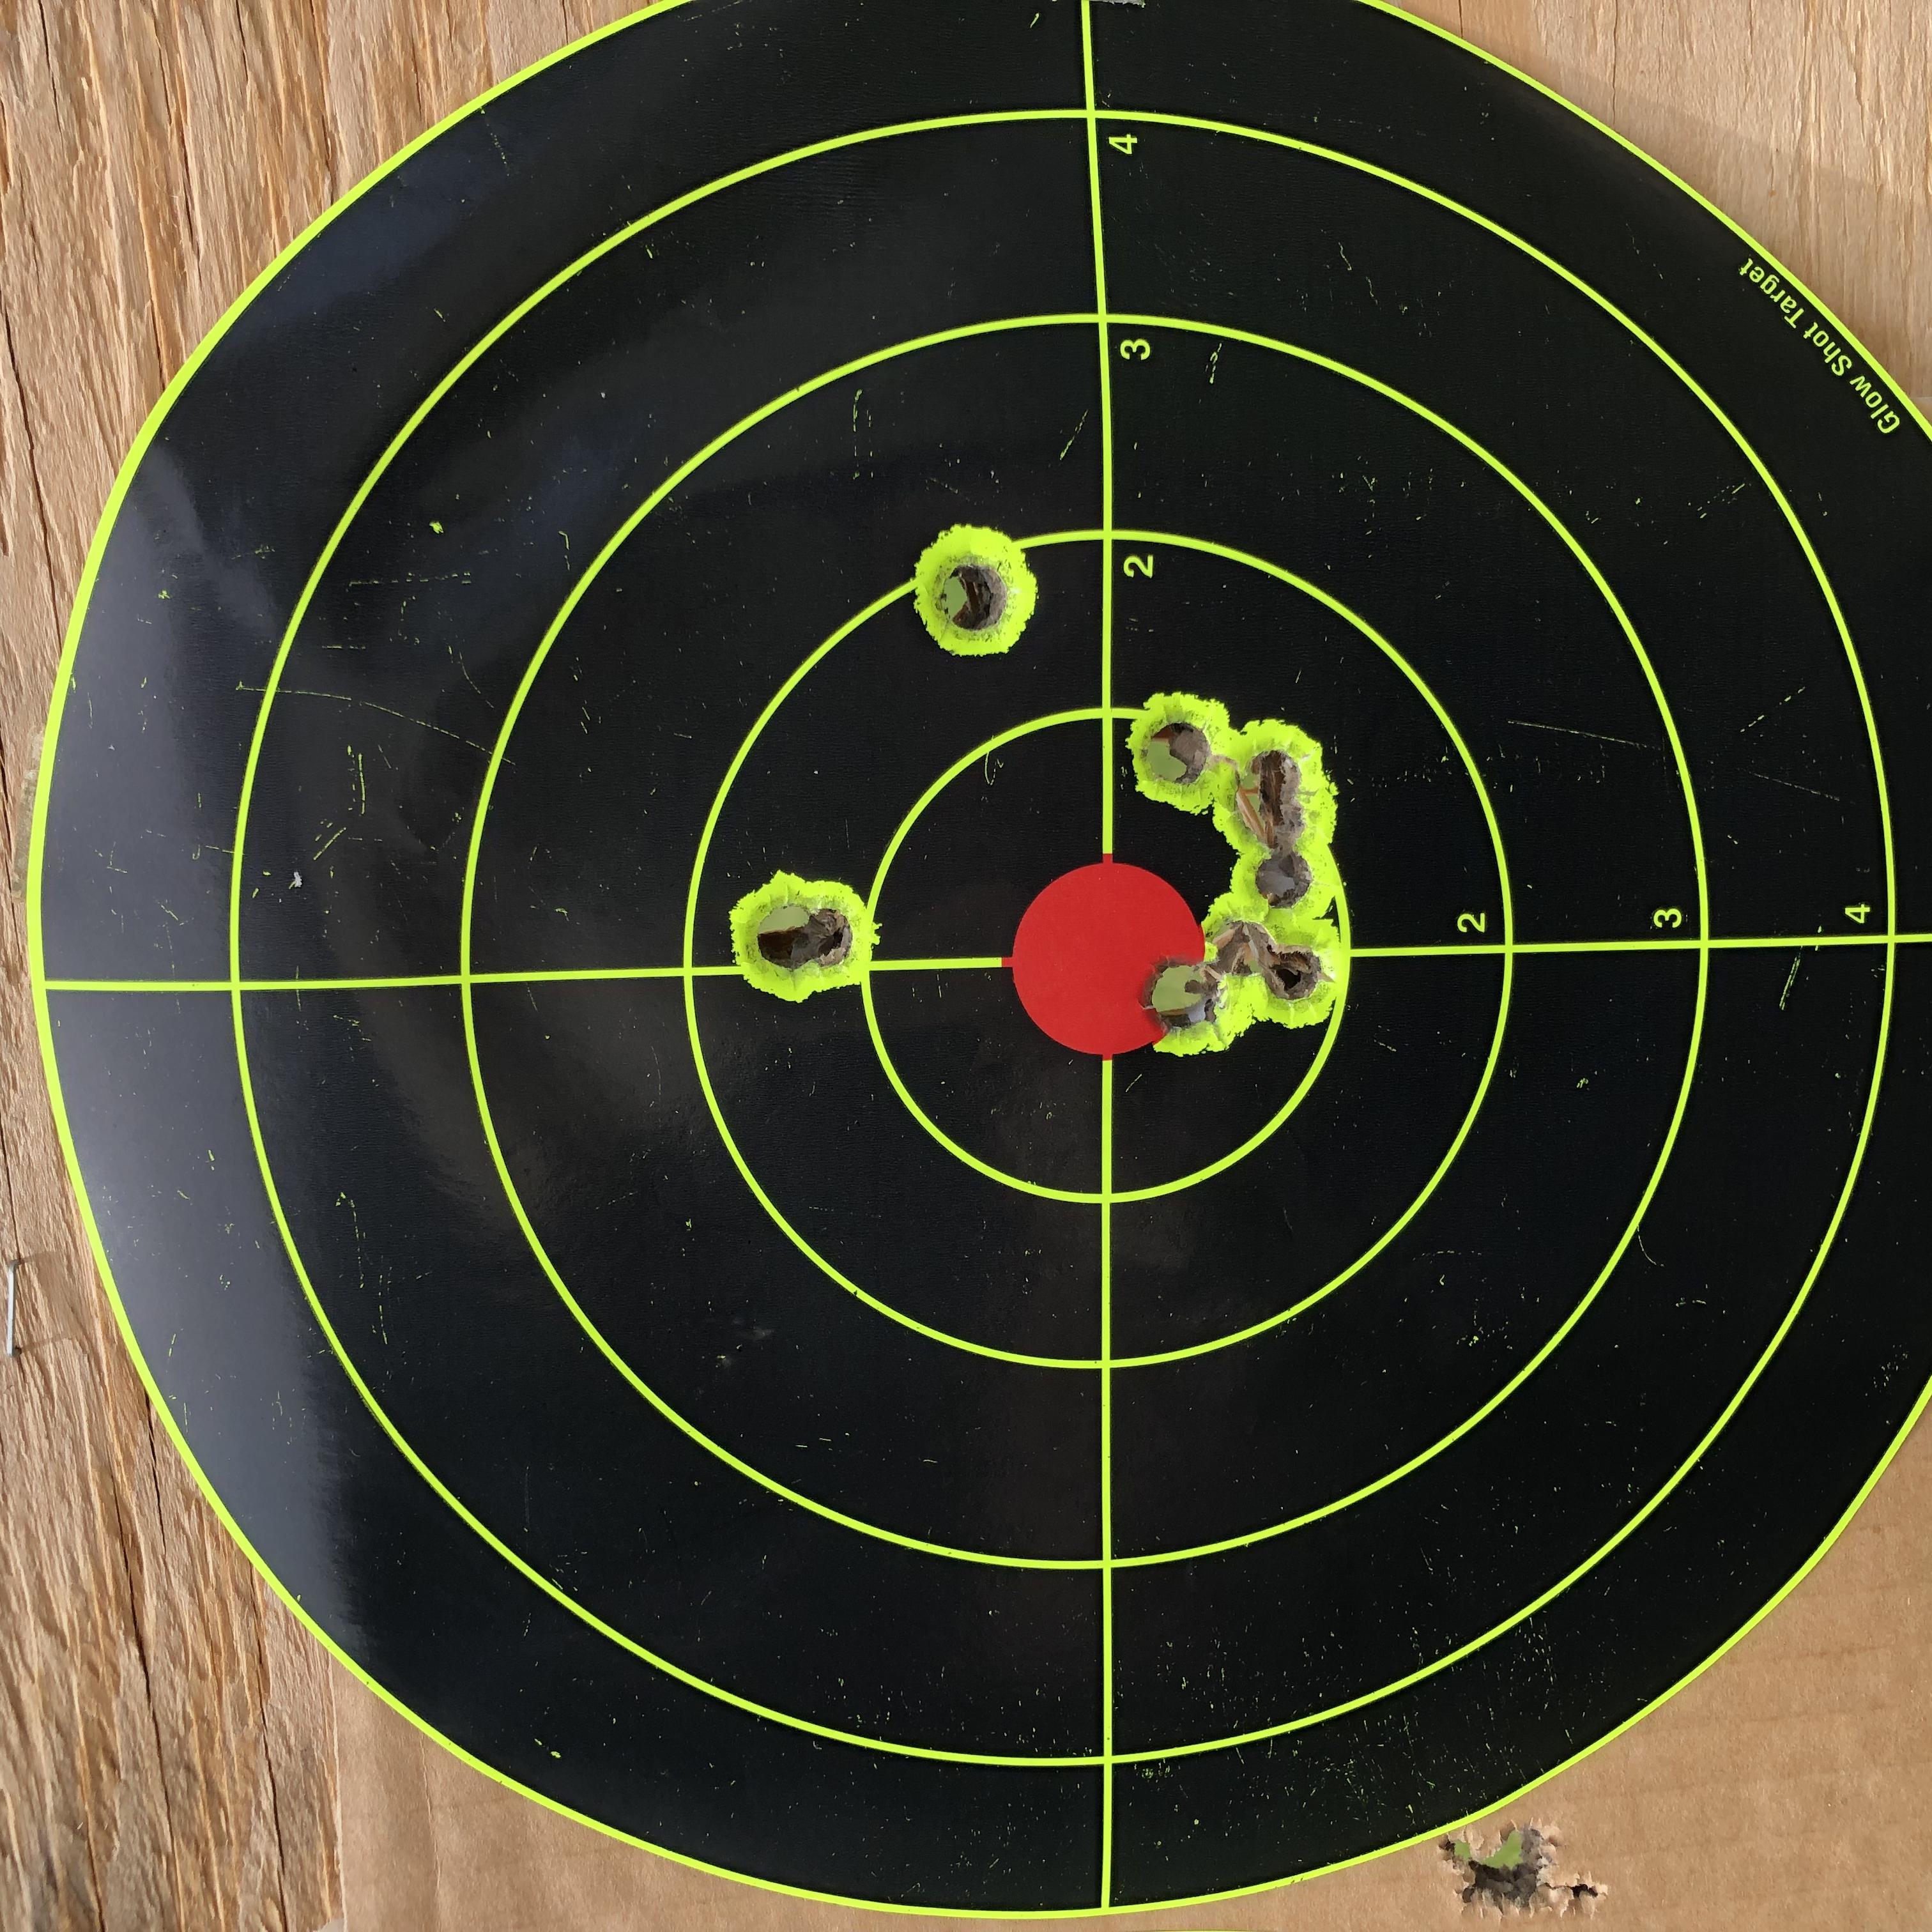 UMP 45 Clone - Need help with .45 3-lug and TiRant-photo-jun-26-12-54-43.jpg